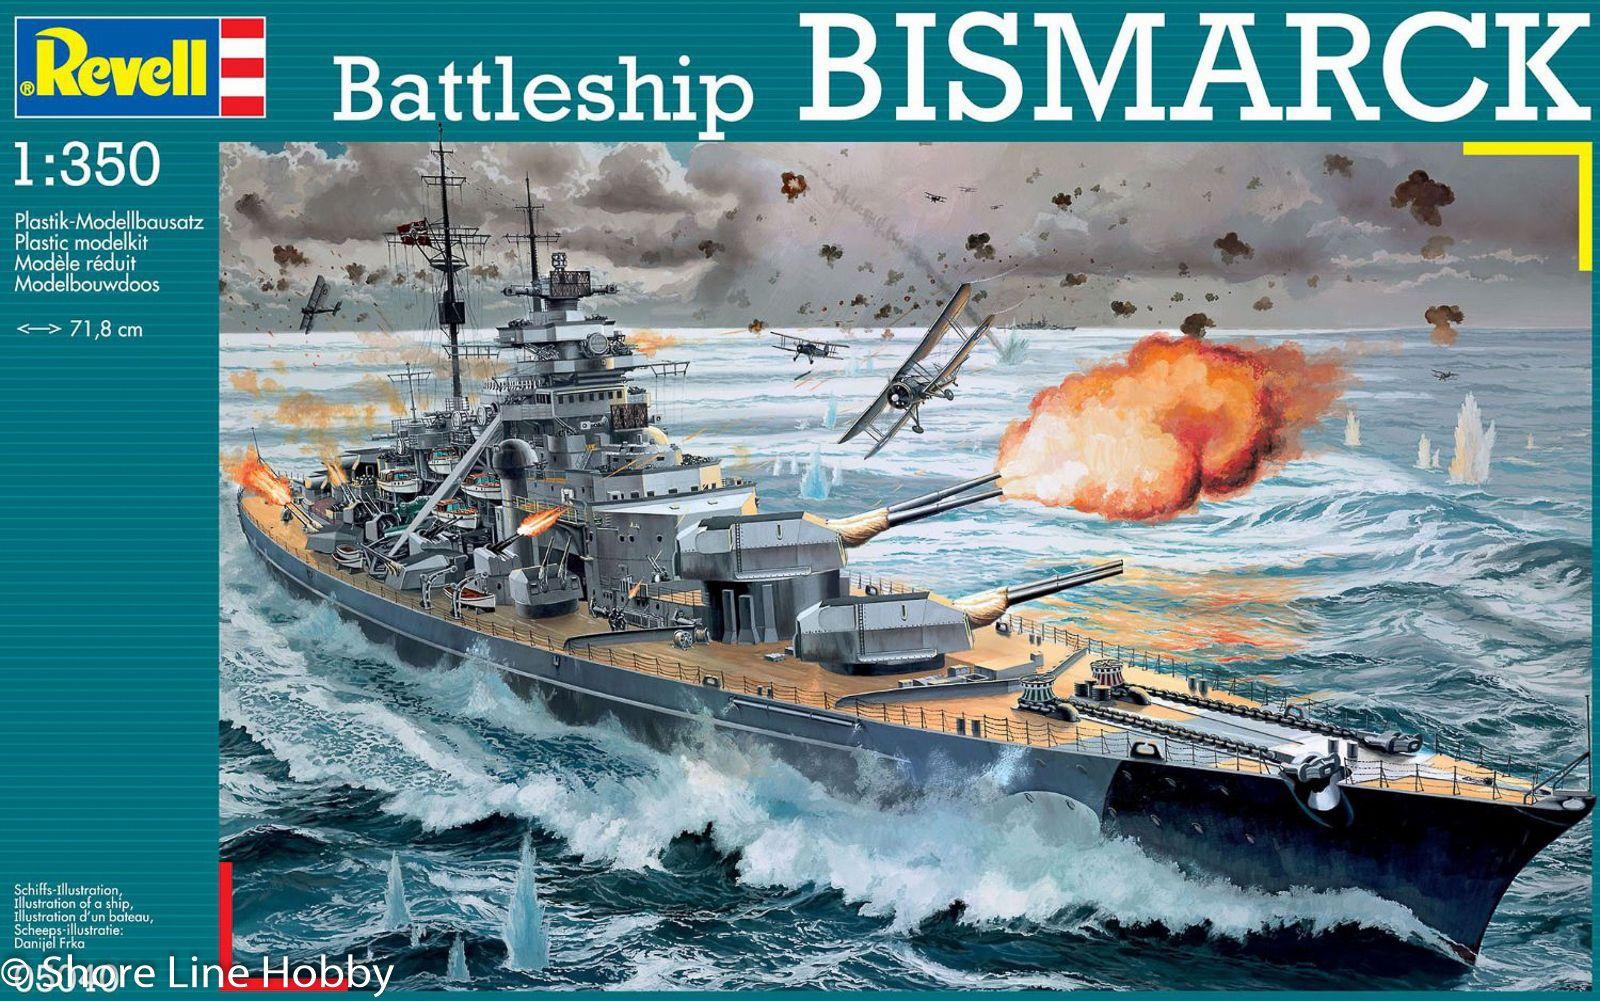 Détails : German Battleship Bismarck Revell 05040 1/350 Model Ship Kit New